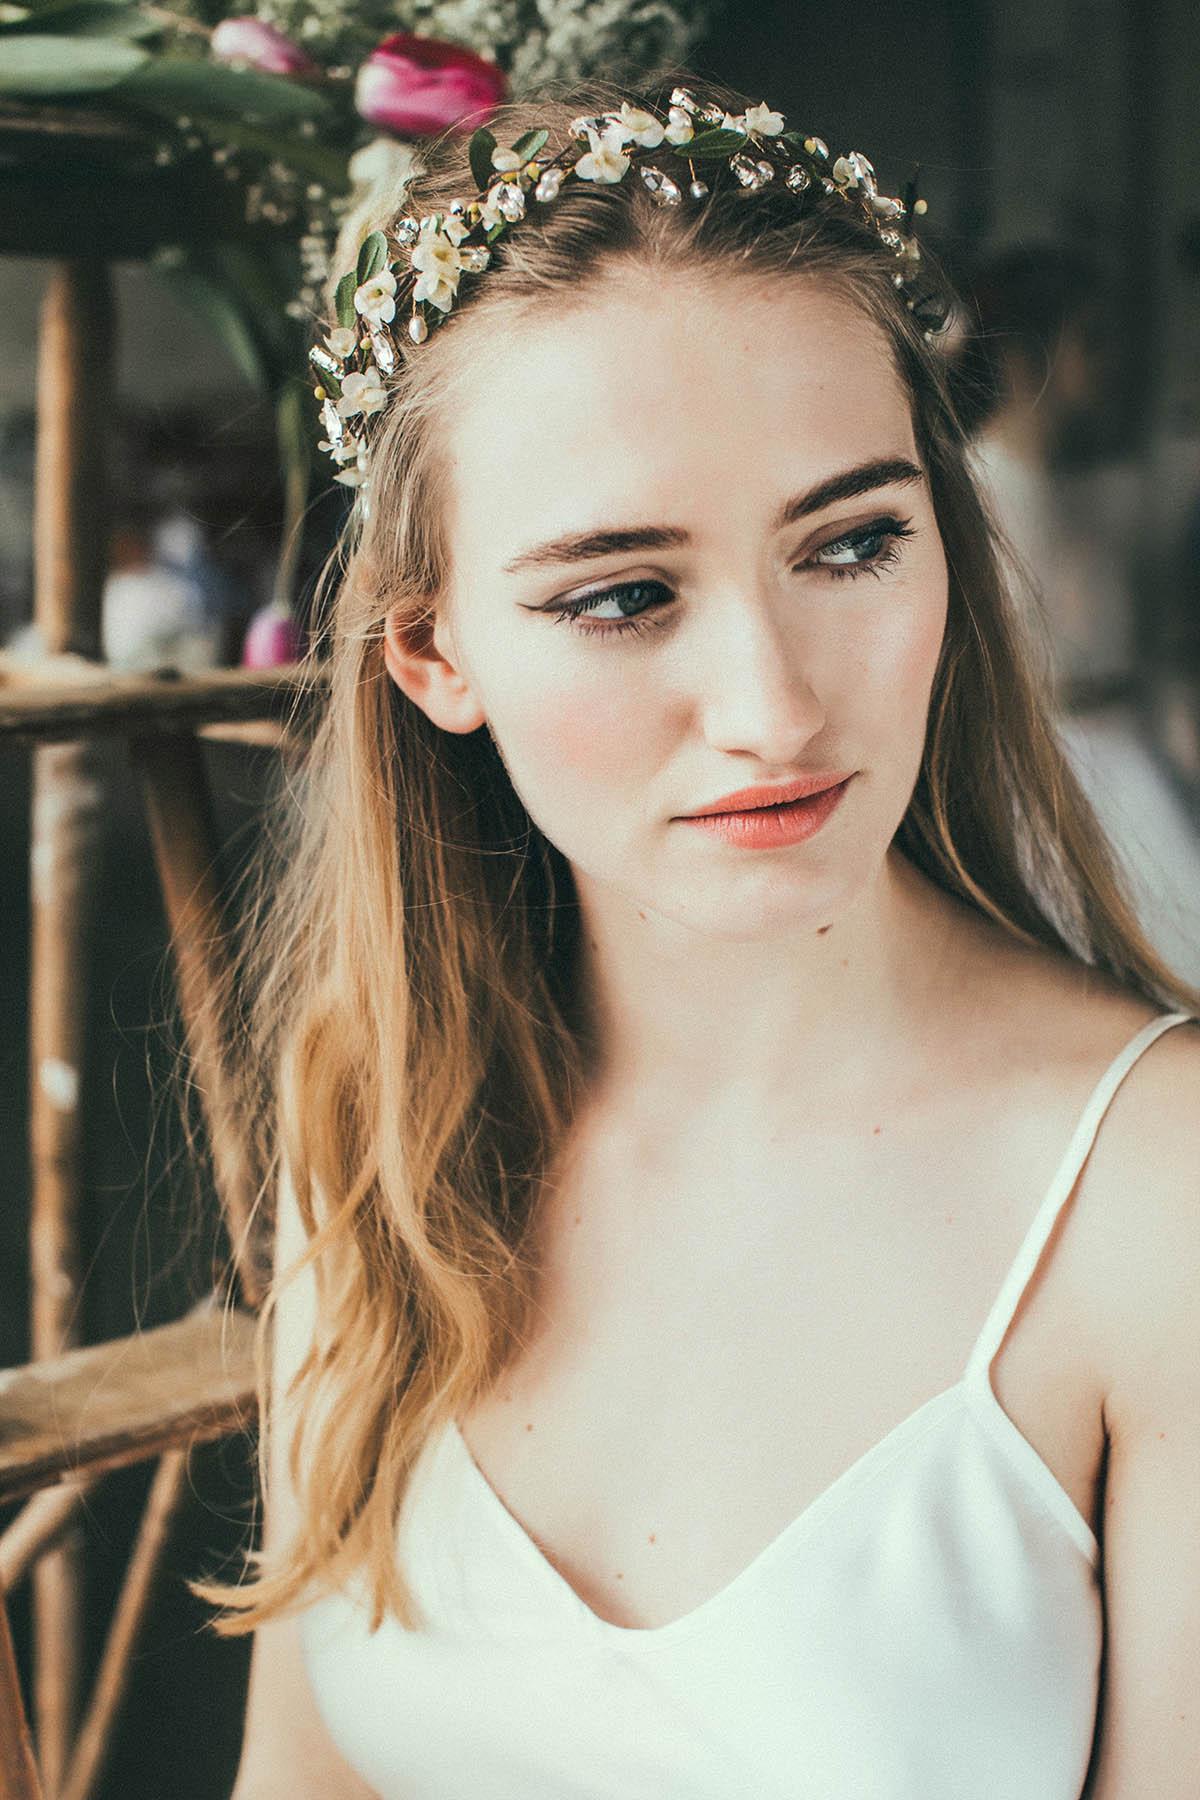 We-Are-Flowergirls_Lookbook_Flowercrown_Blumenkranz_SS17_c_Lupi-Spuma_Web_25.jpg